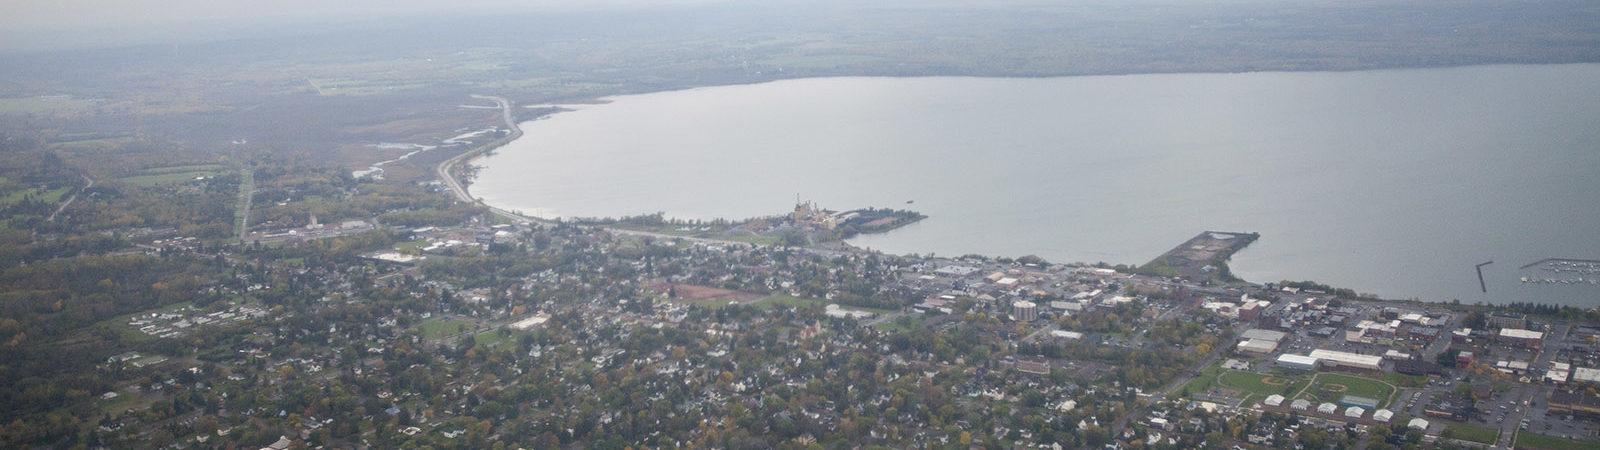 Aerial shot of Ashland and Chequamegon Bay